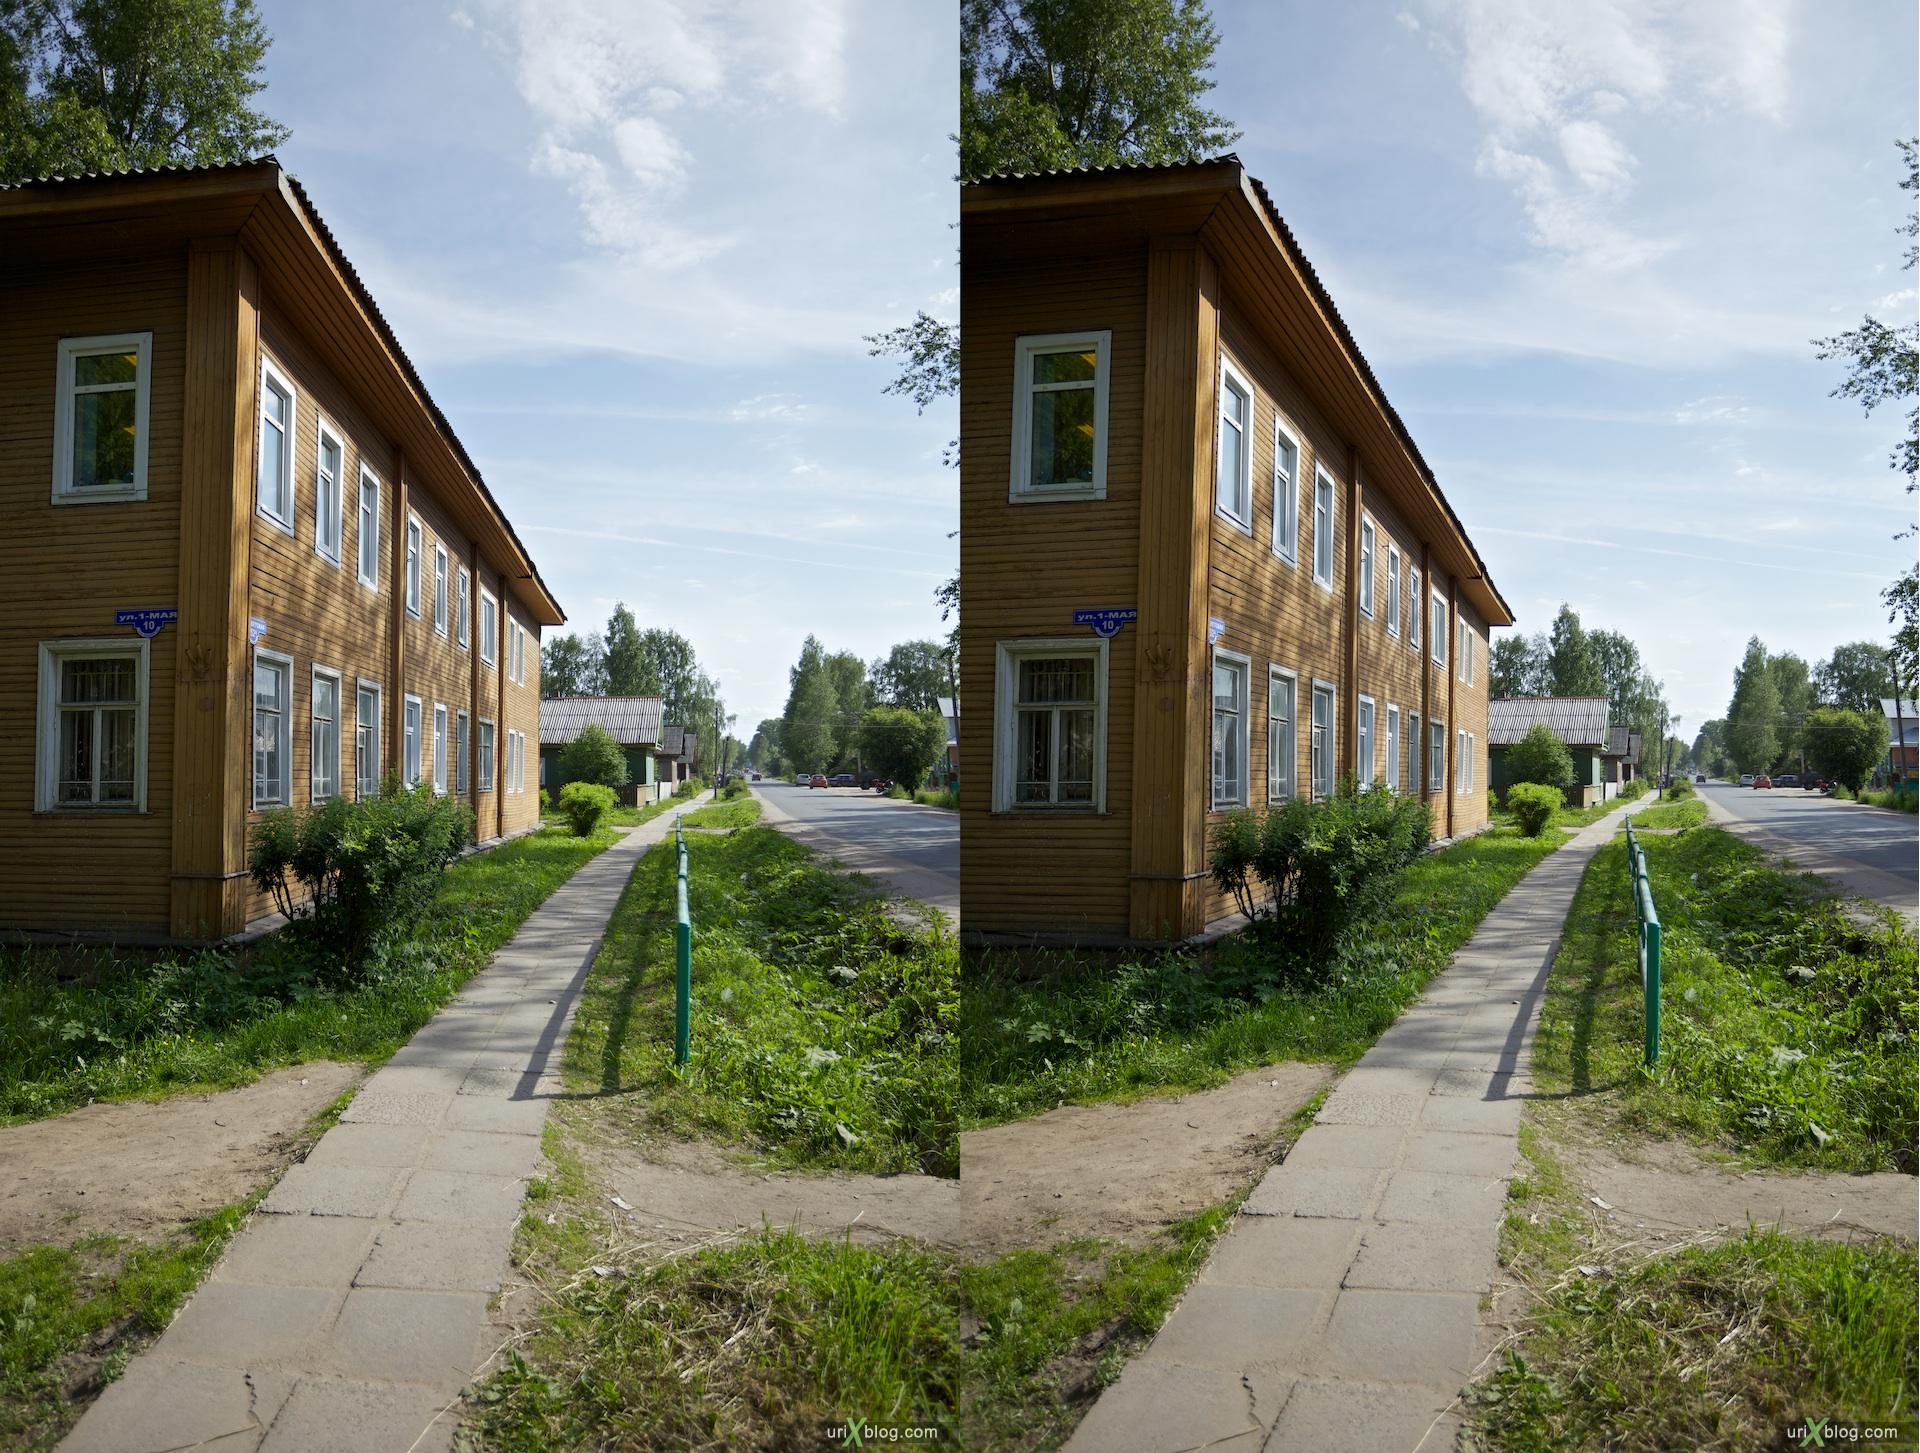 2010 3D, stereo, cross-eyed, стерео, стереопара Velsk, Arkhangelsk Oblast Вельск, Архангельская обл